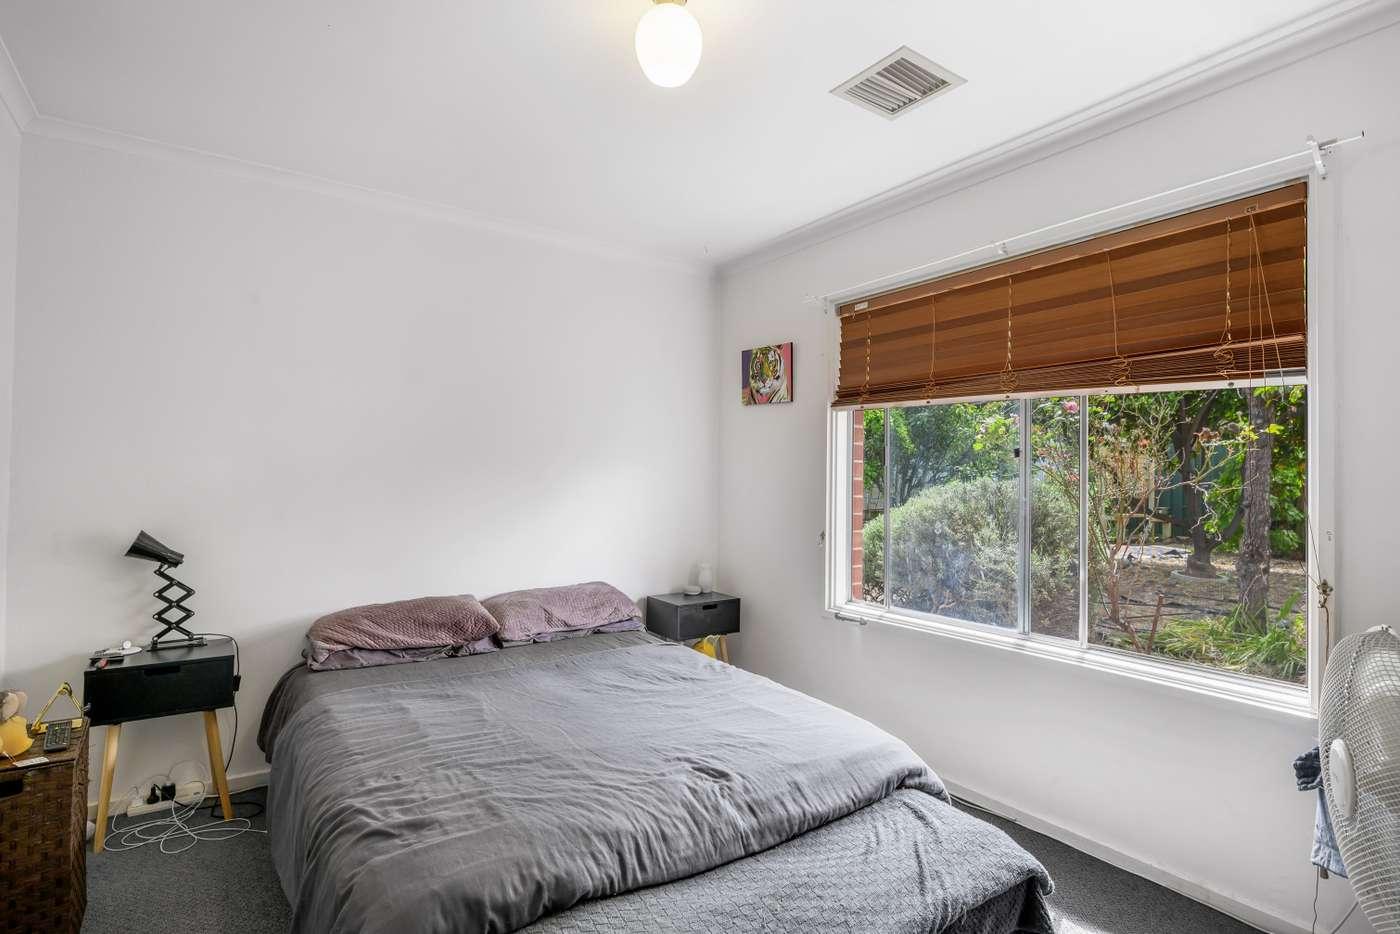 Fifth view of Homely house listing, 12 Leech Avenue, Morphett Vale SA 5162